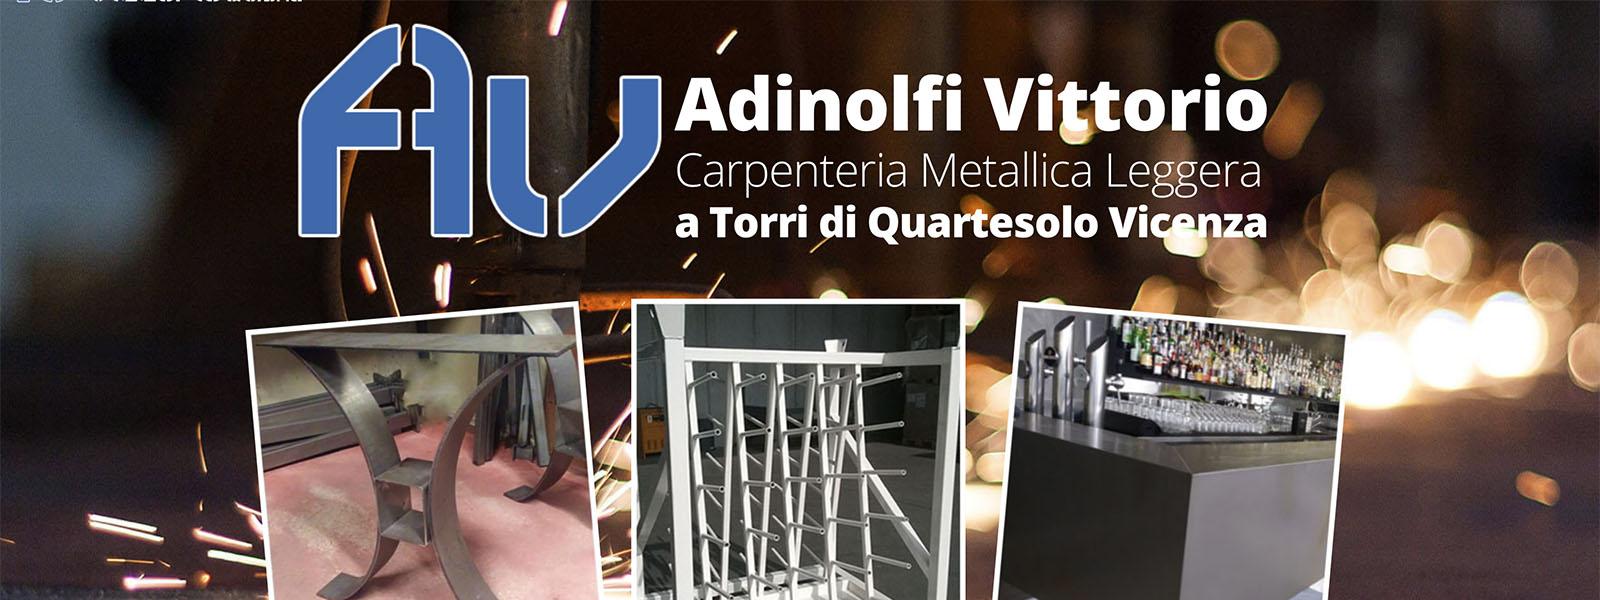 Sito Web Adinolfi Vittorio Carpenteria